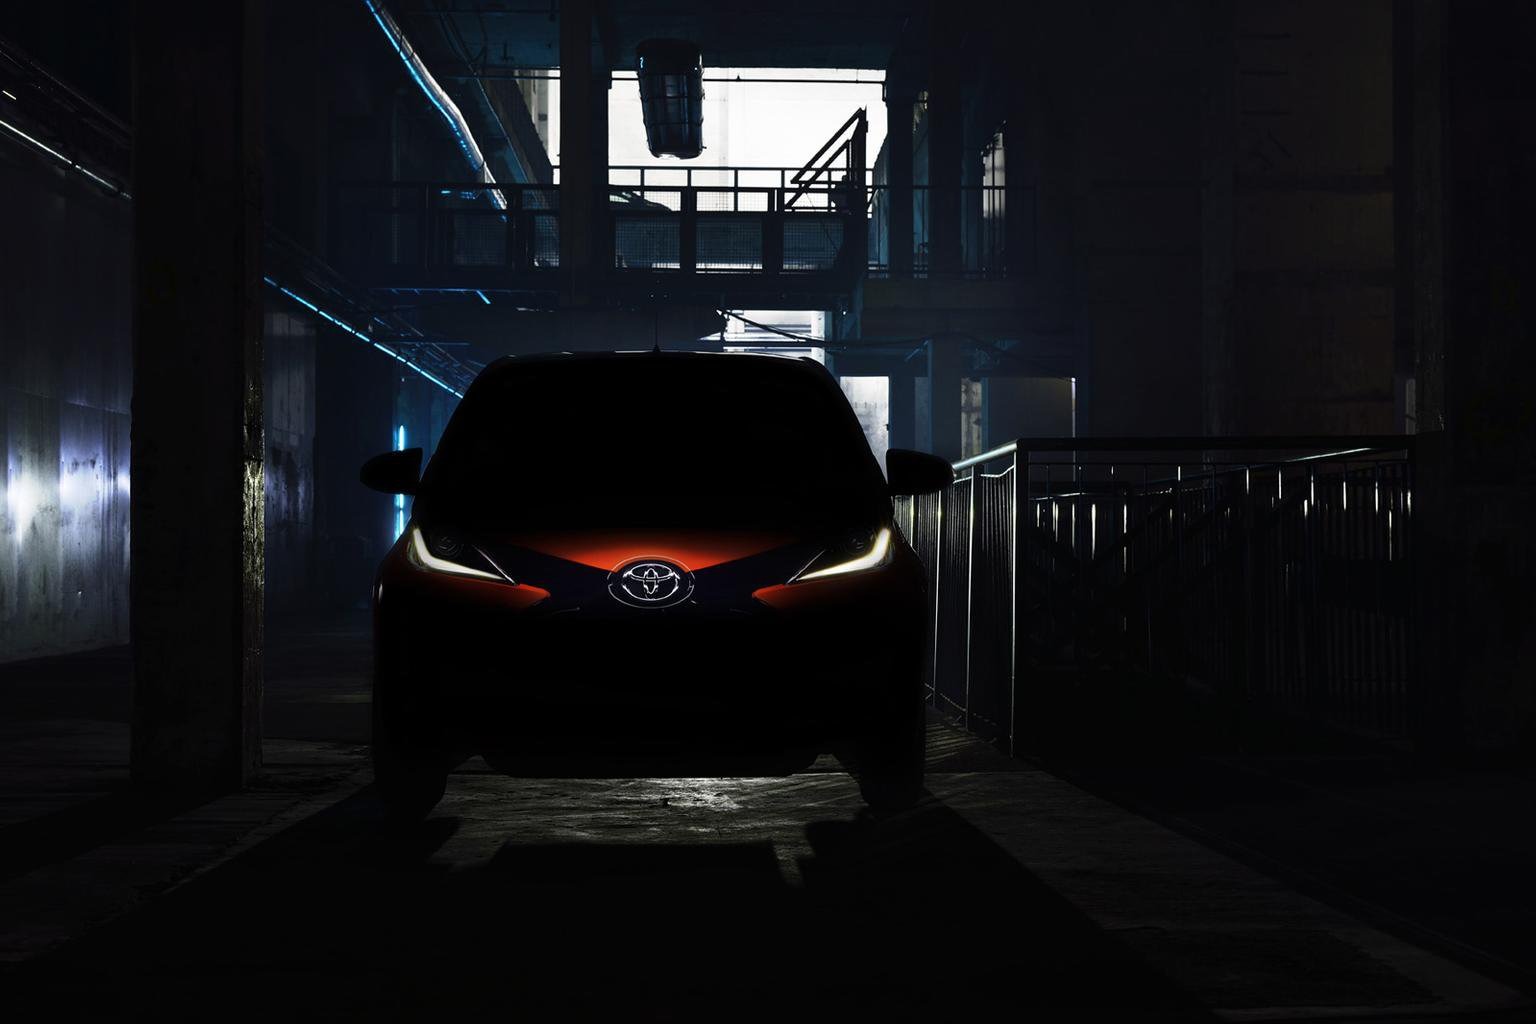 2014 Toyota Aygo teaser shot revealed